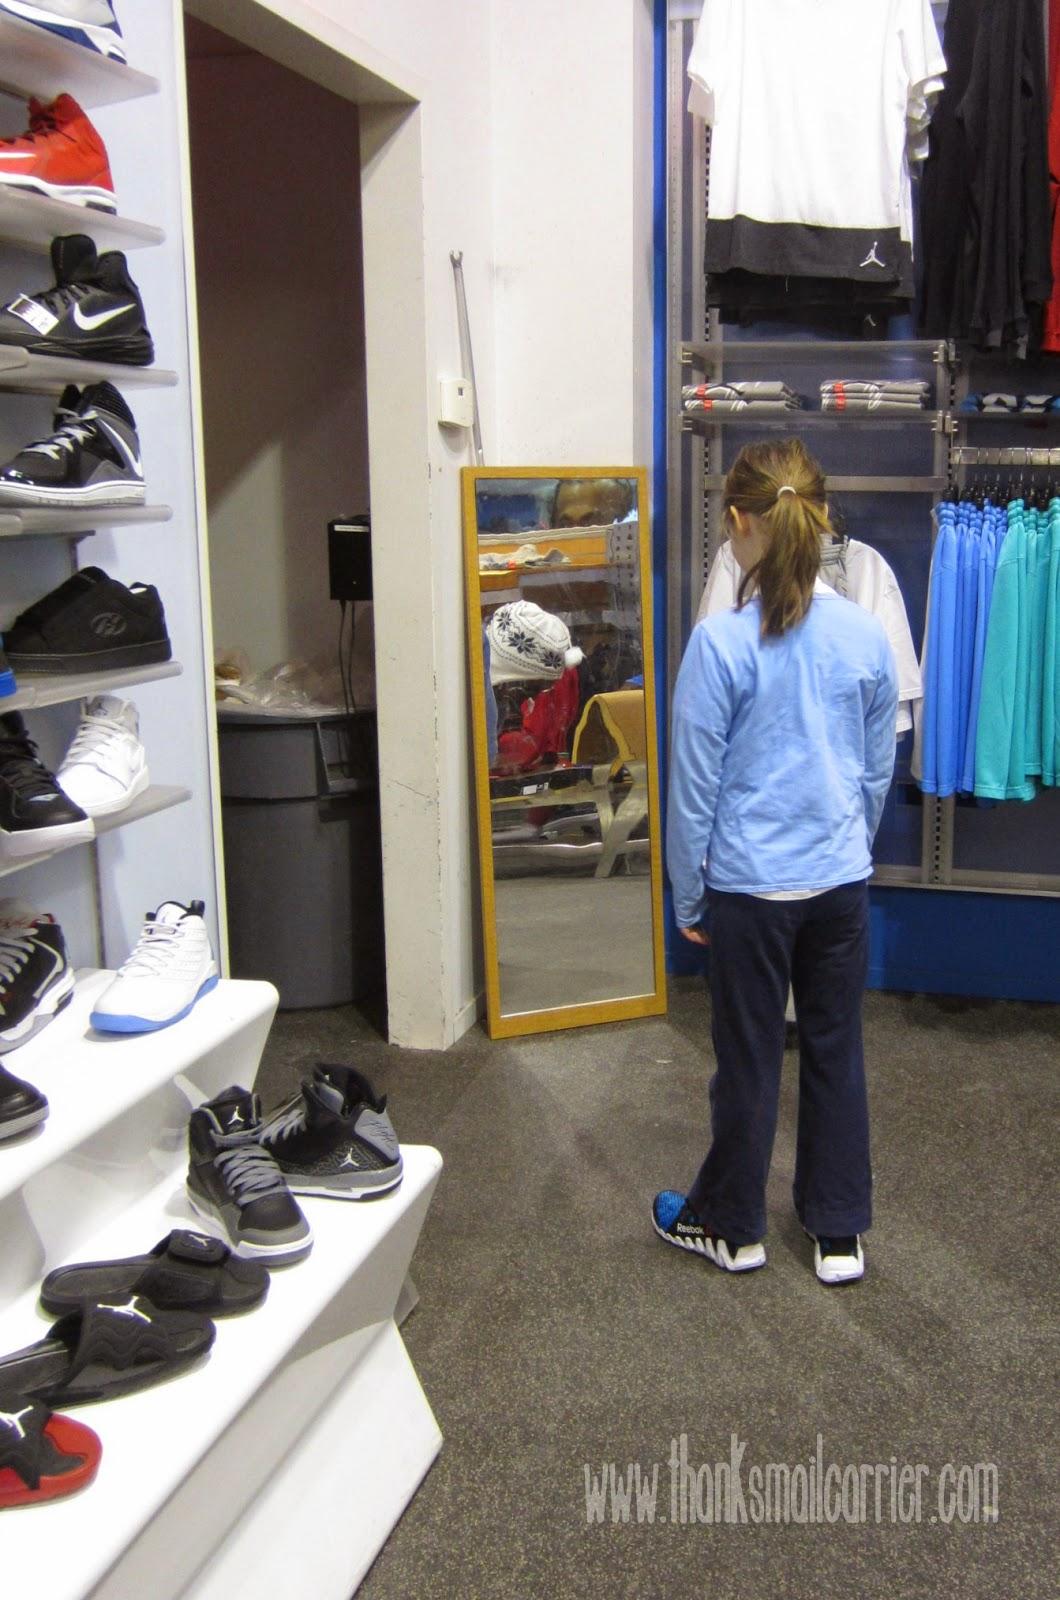 Finish Line kids shoes